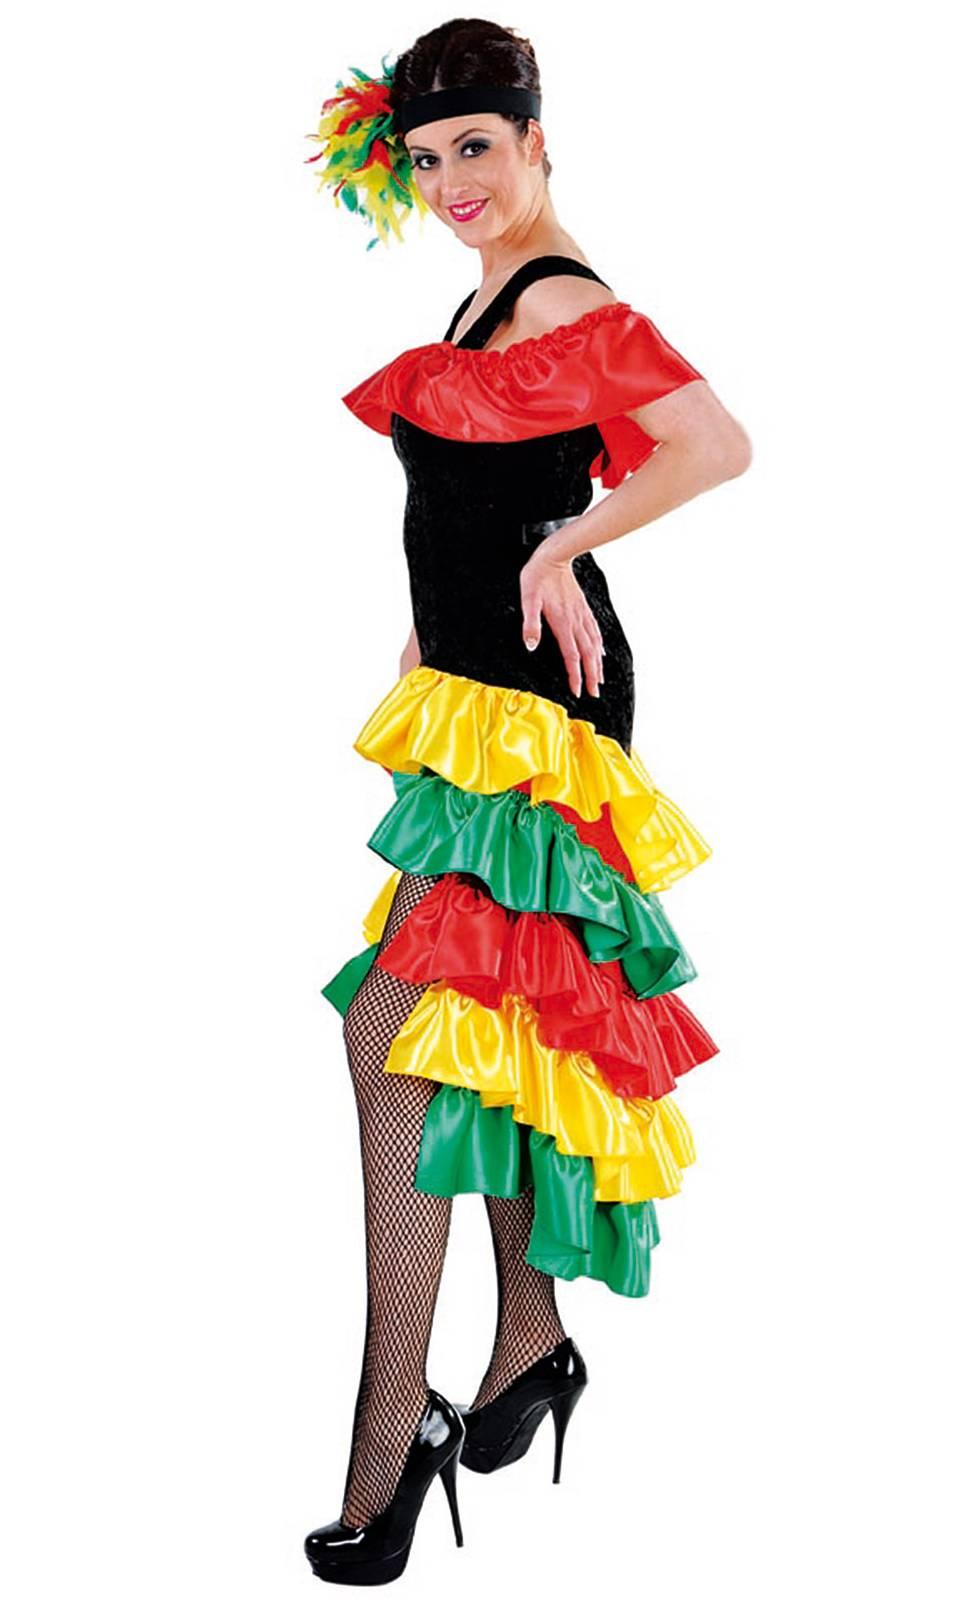 Costume-Brésilienne-Femme-Grande-taille-3